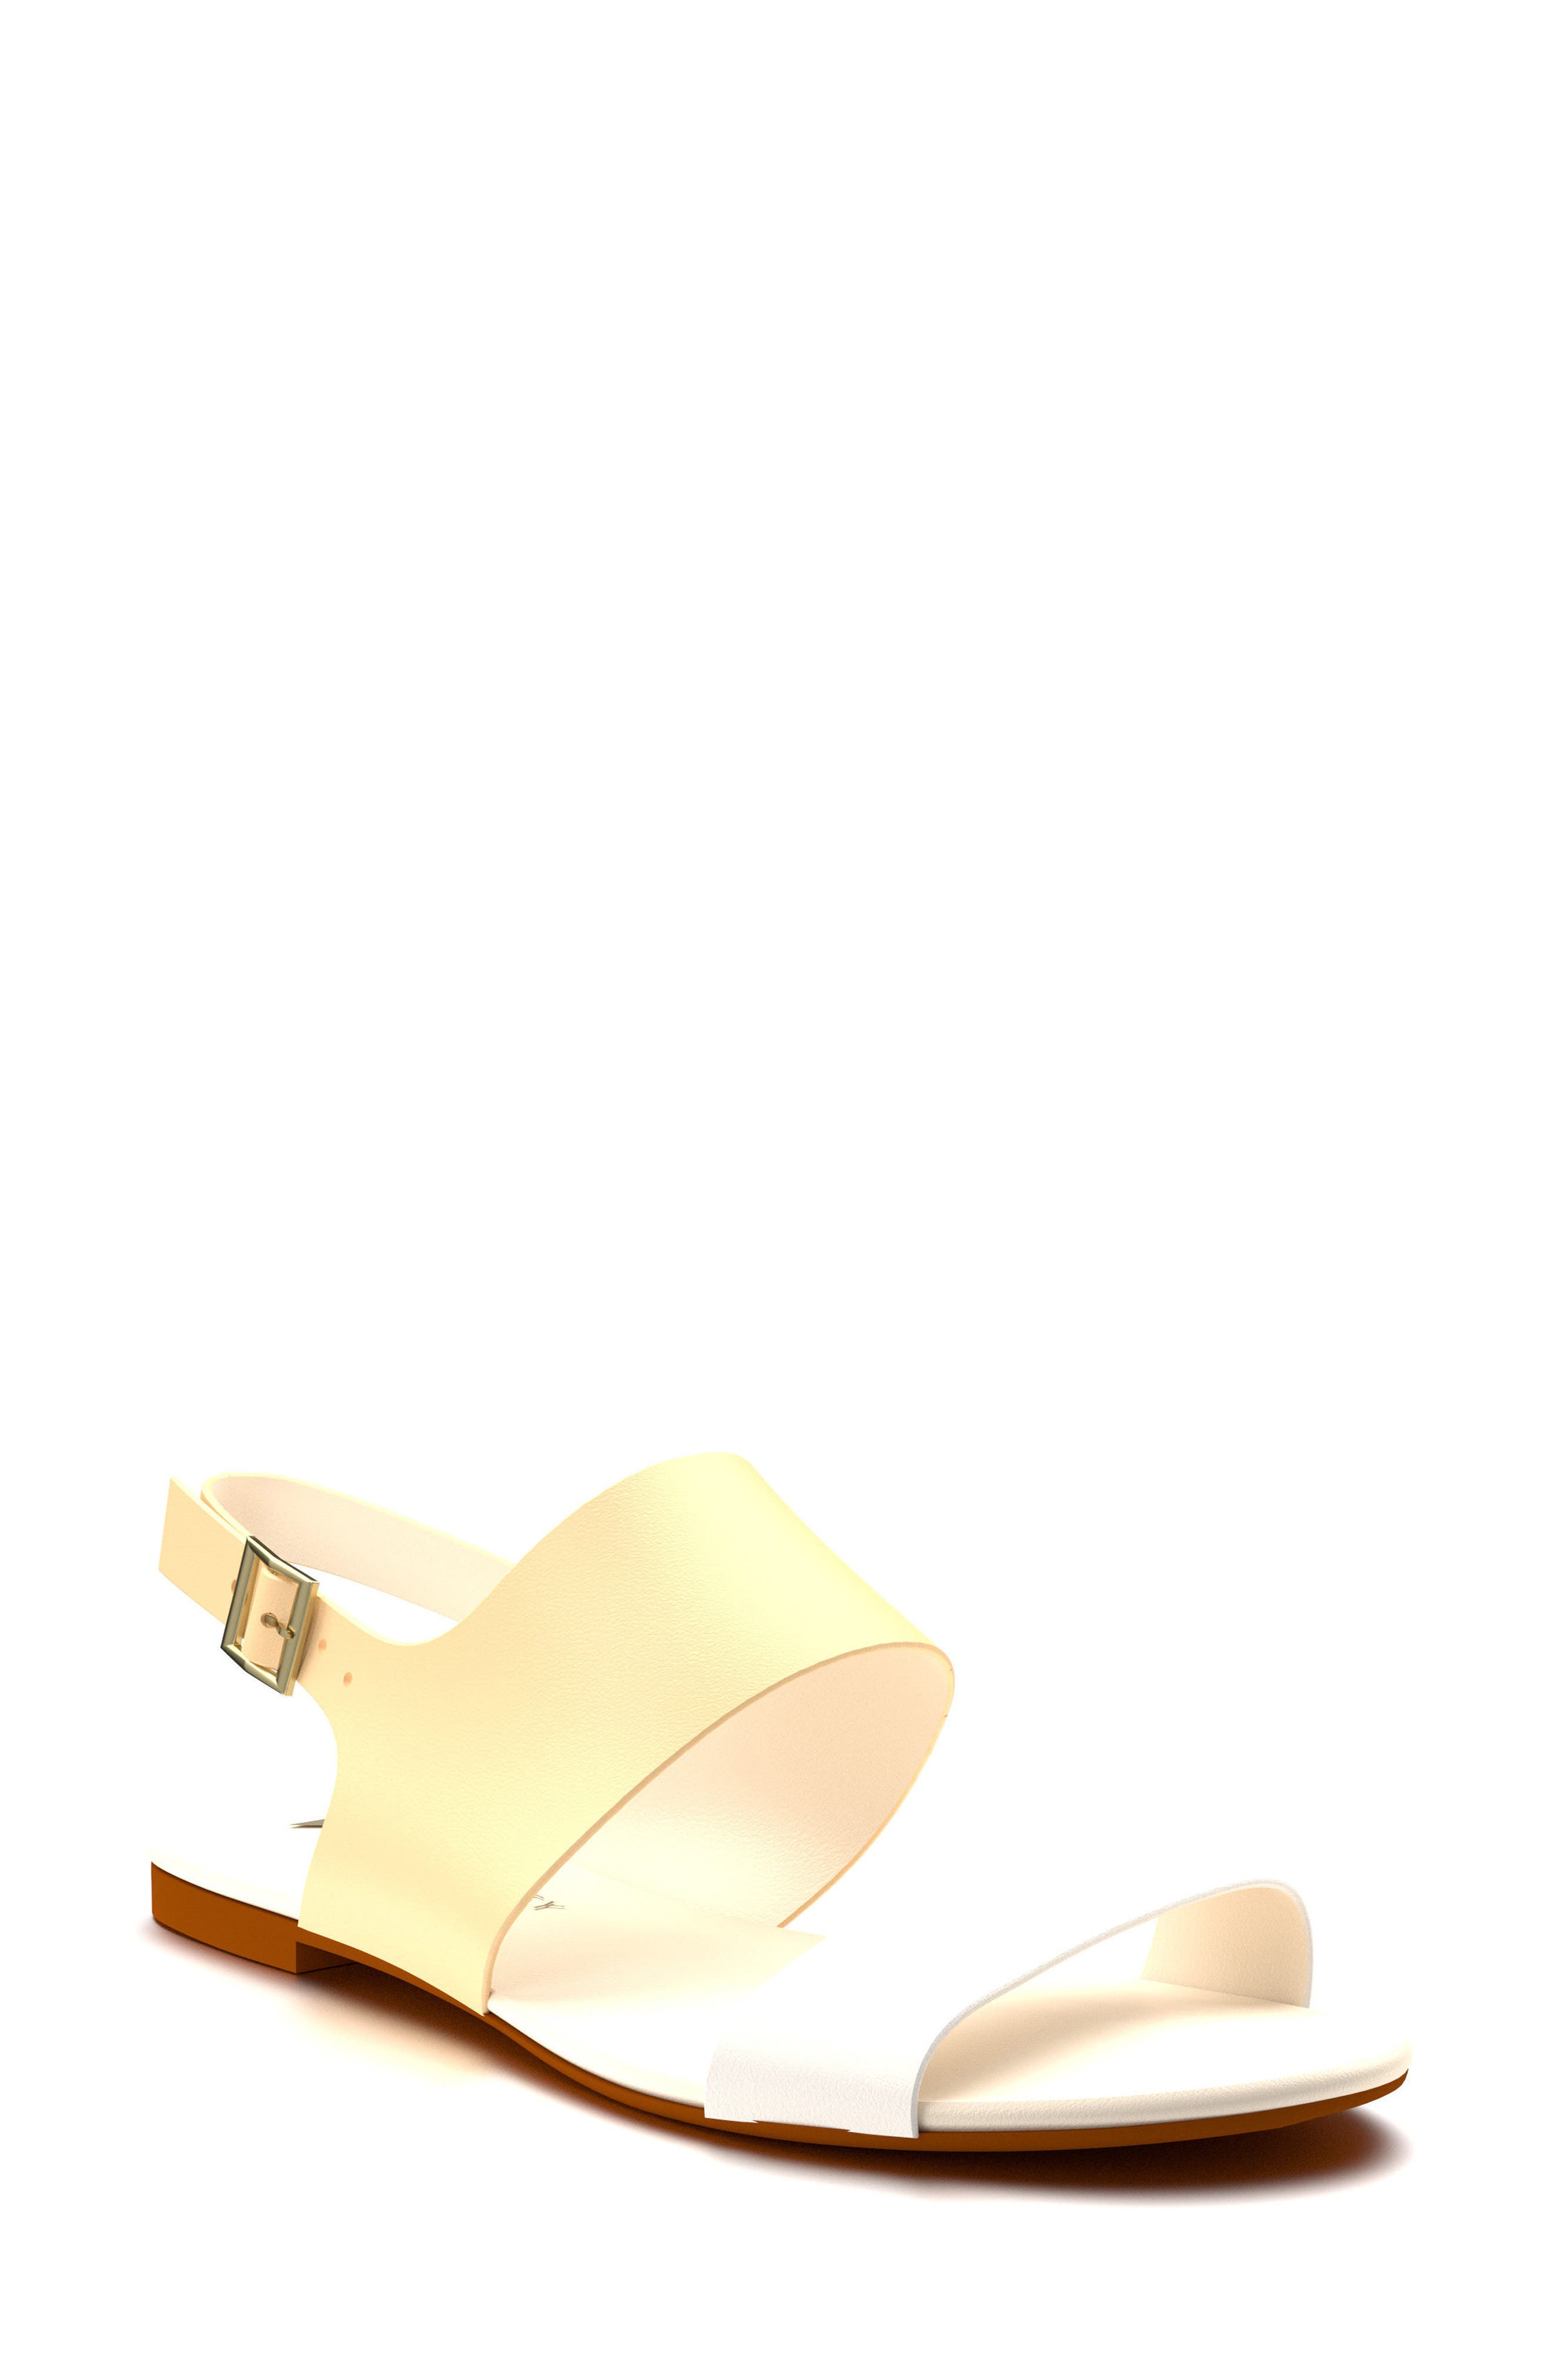 Shoes of Prey Slingback Flat Sandal (Women)